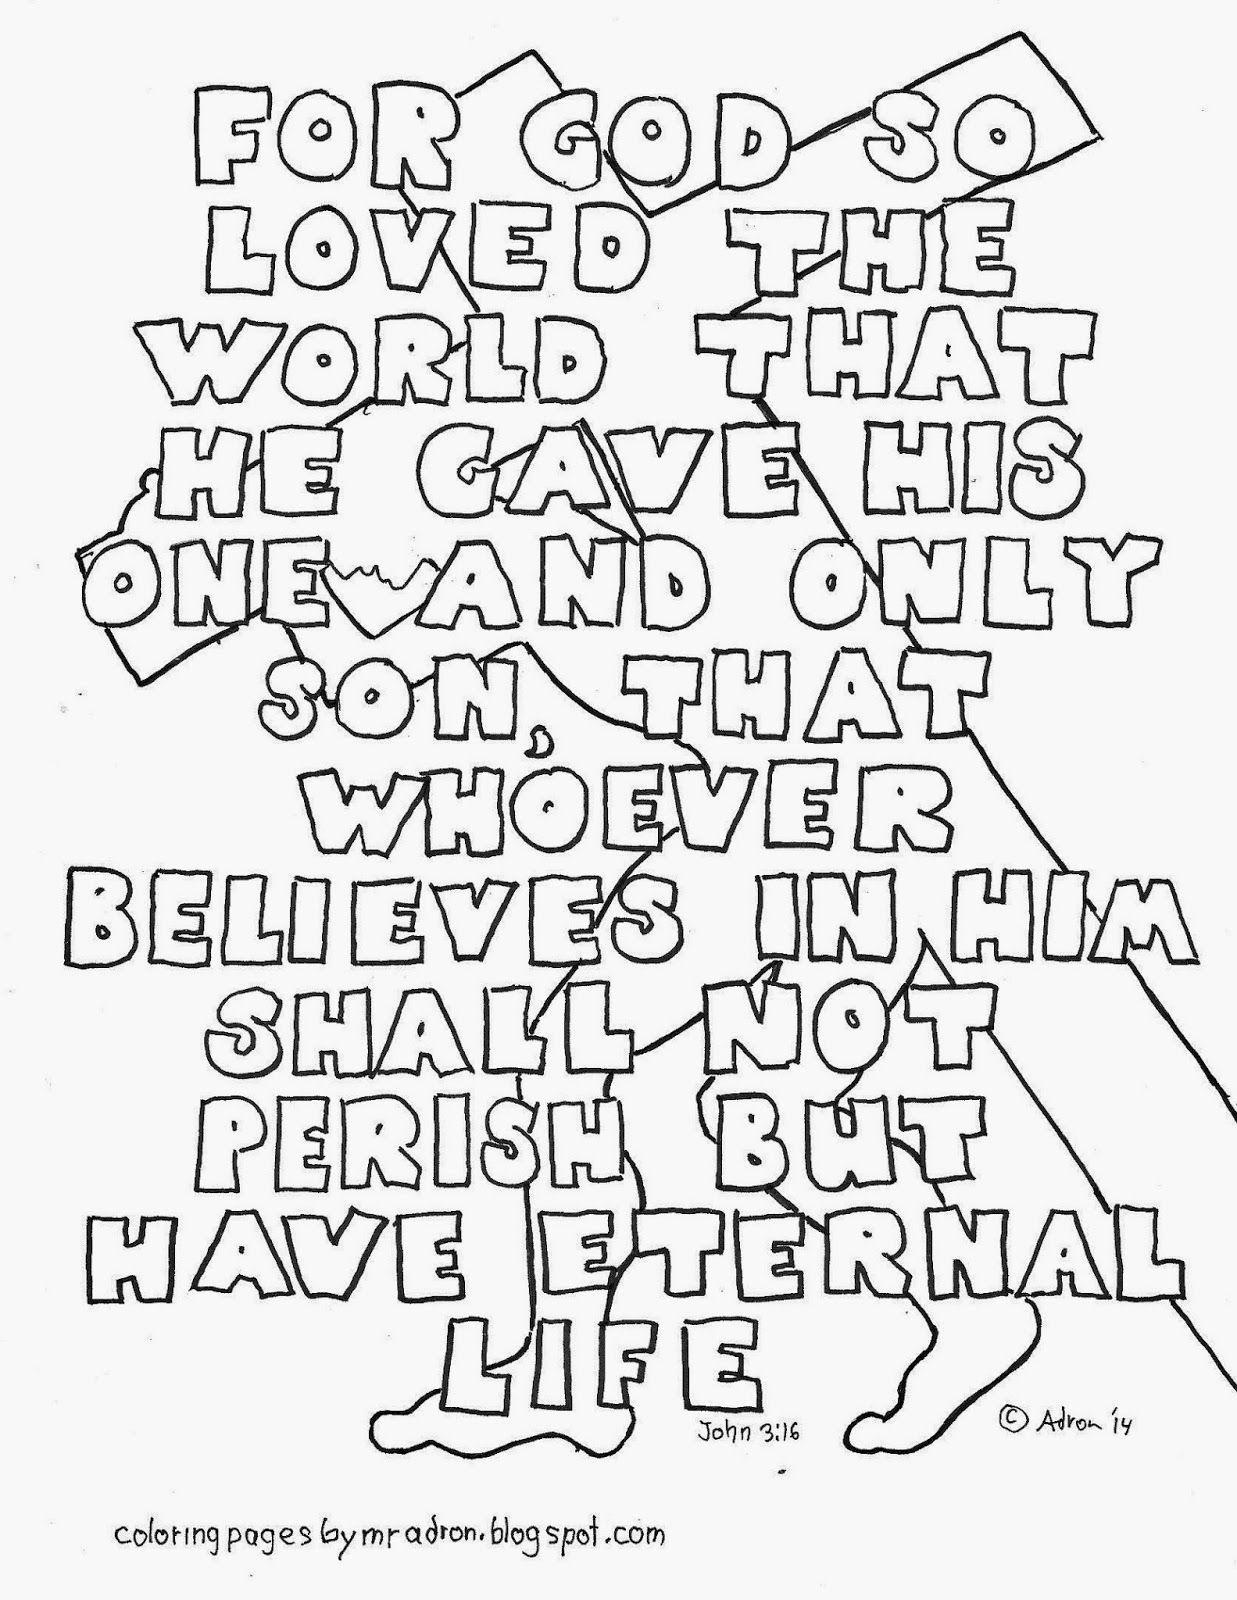 John 3:16 Coloring page. see more at my blog: http